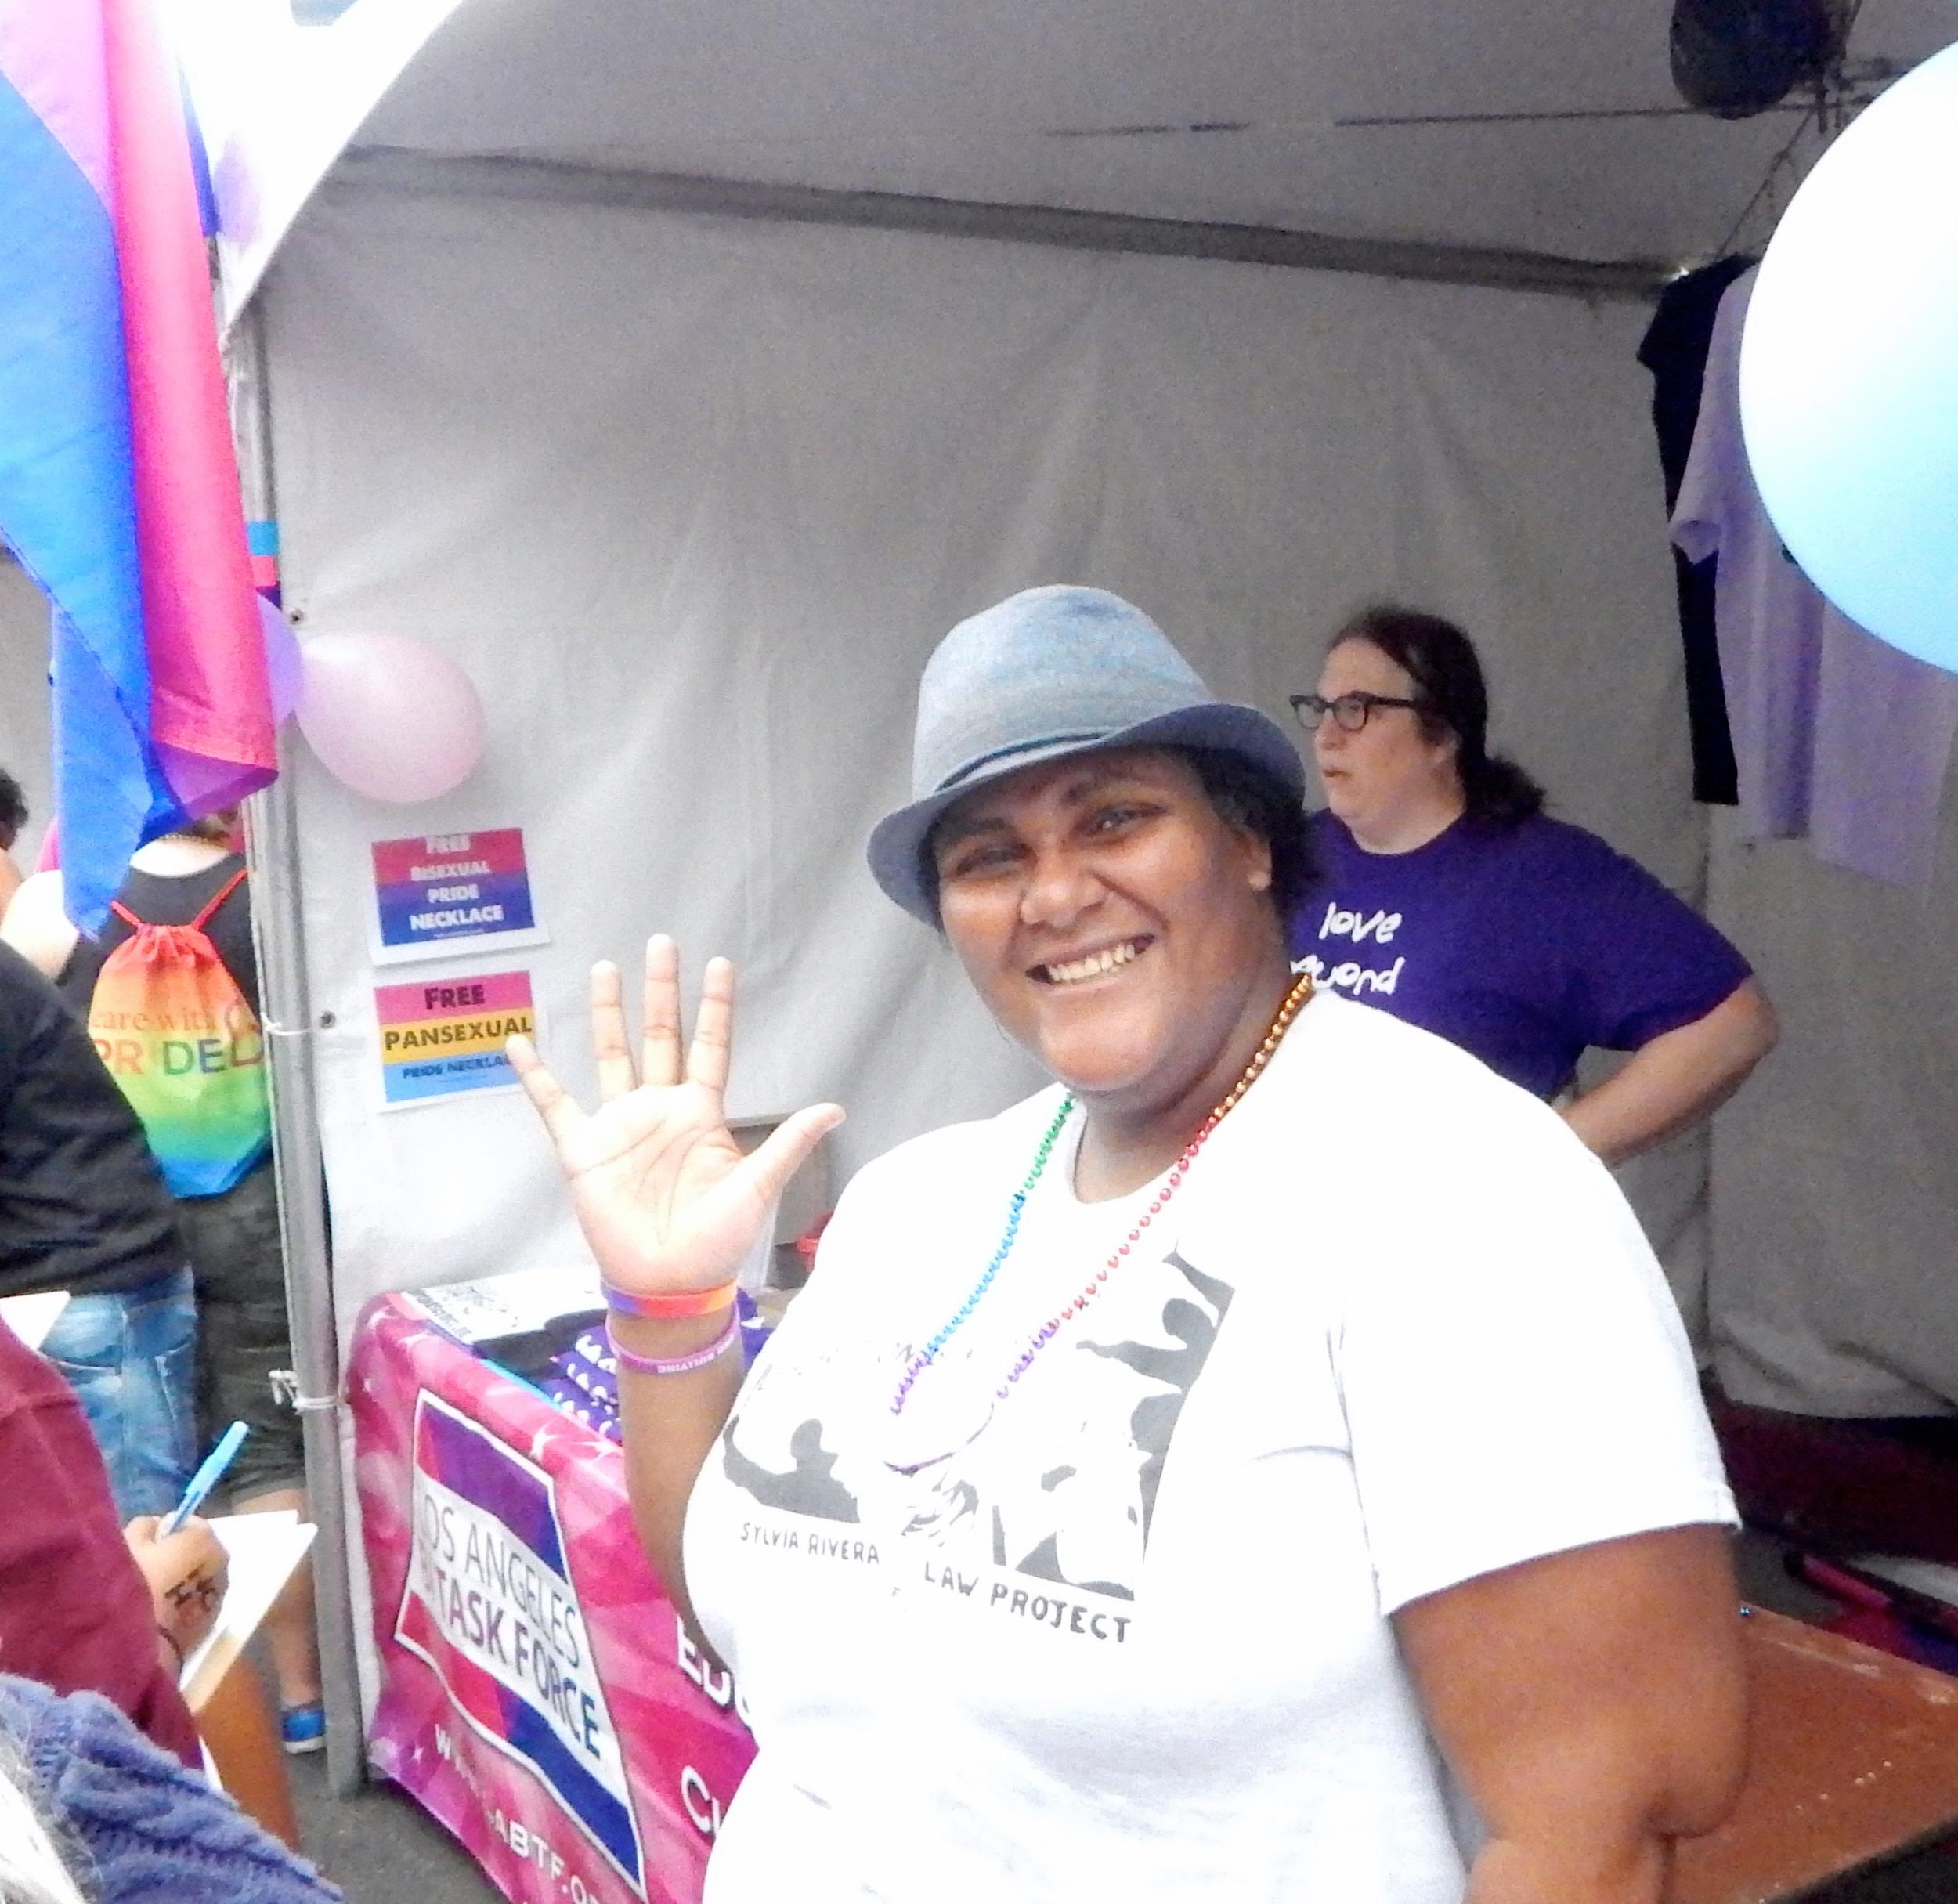 Faith Cheltenham at the LA Bi Task Force Booth